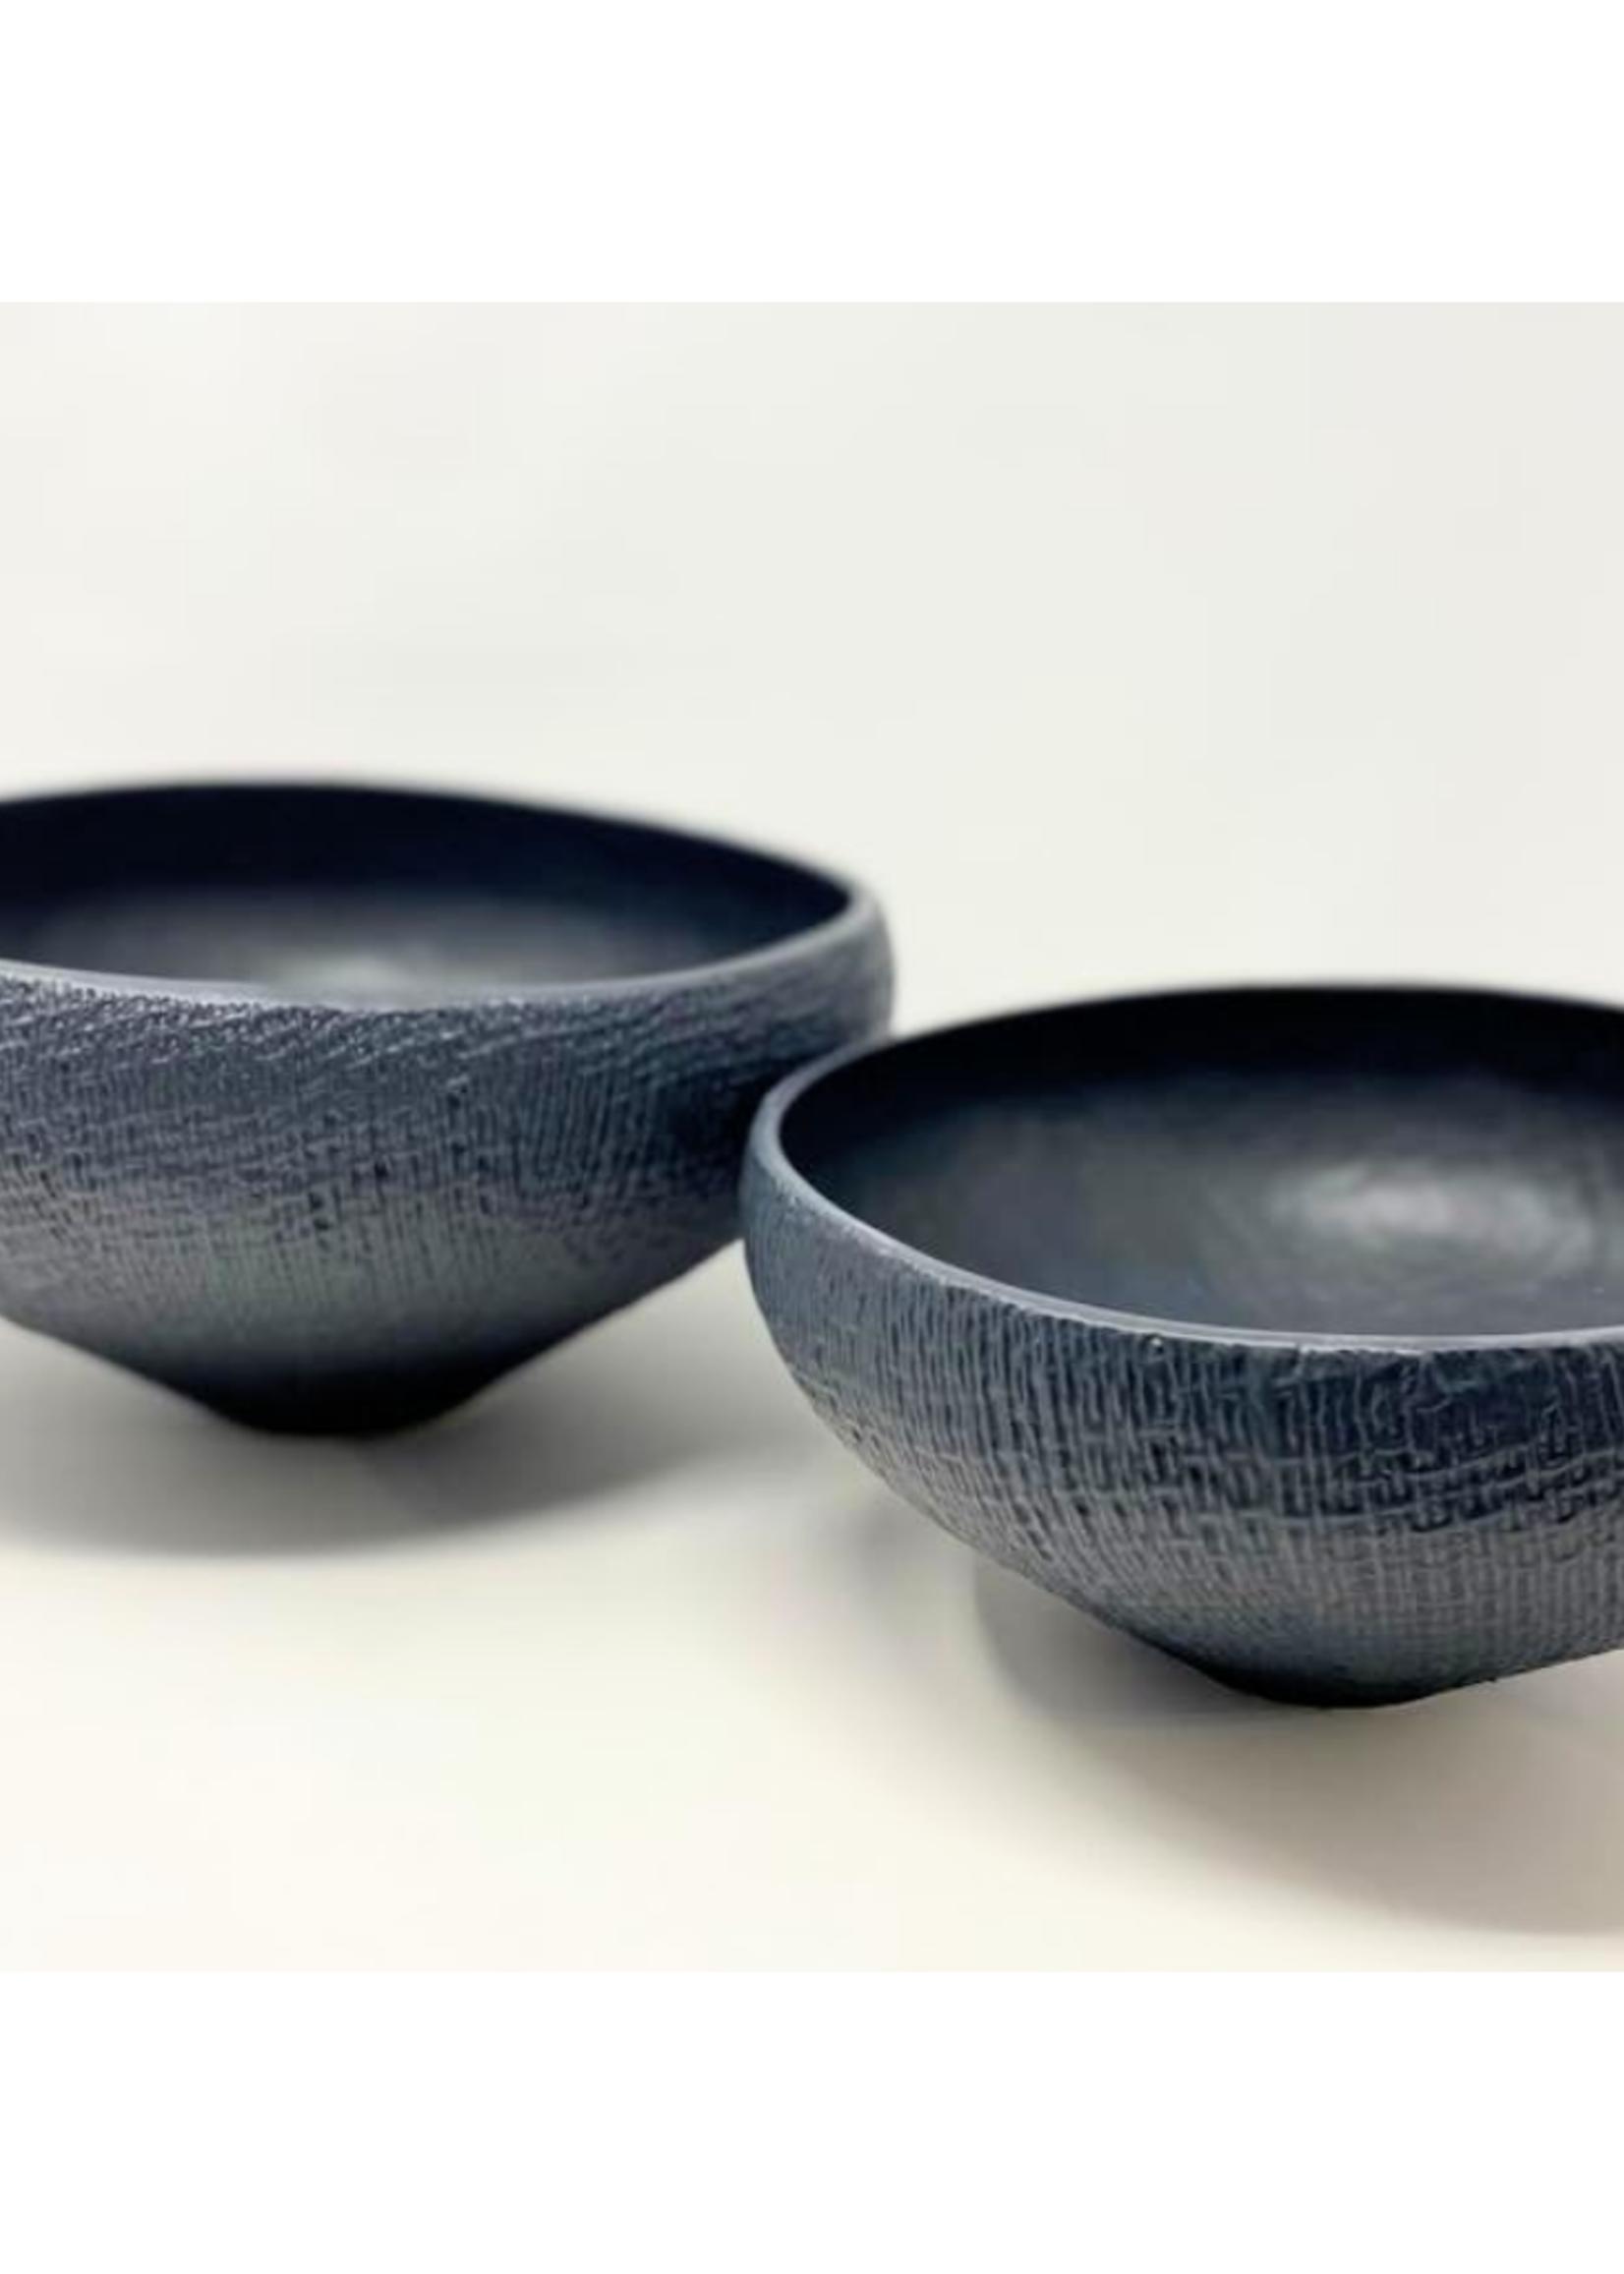 Mara Sand Organic Ceramic Black Bowl Small